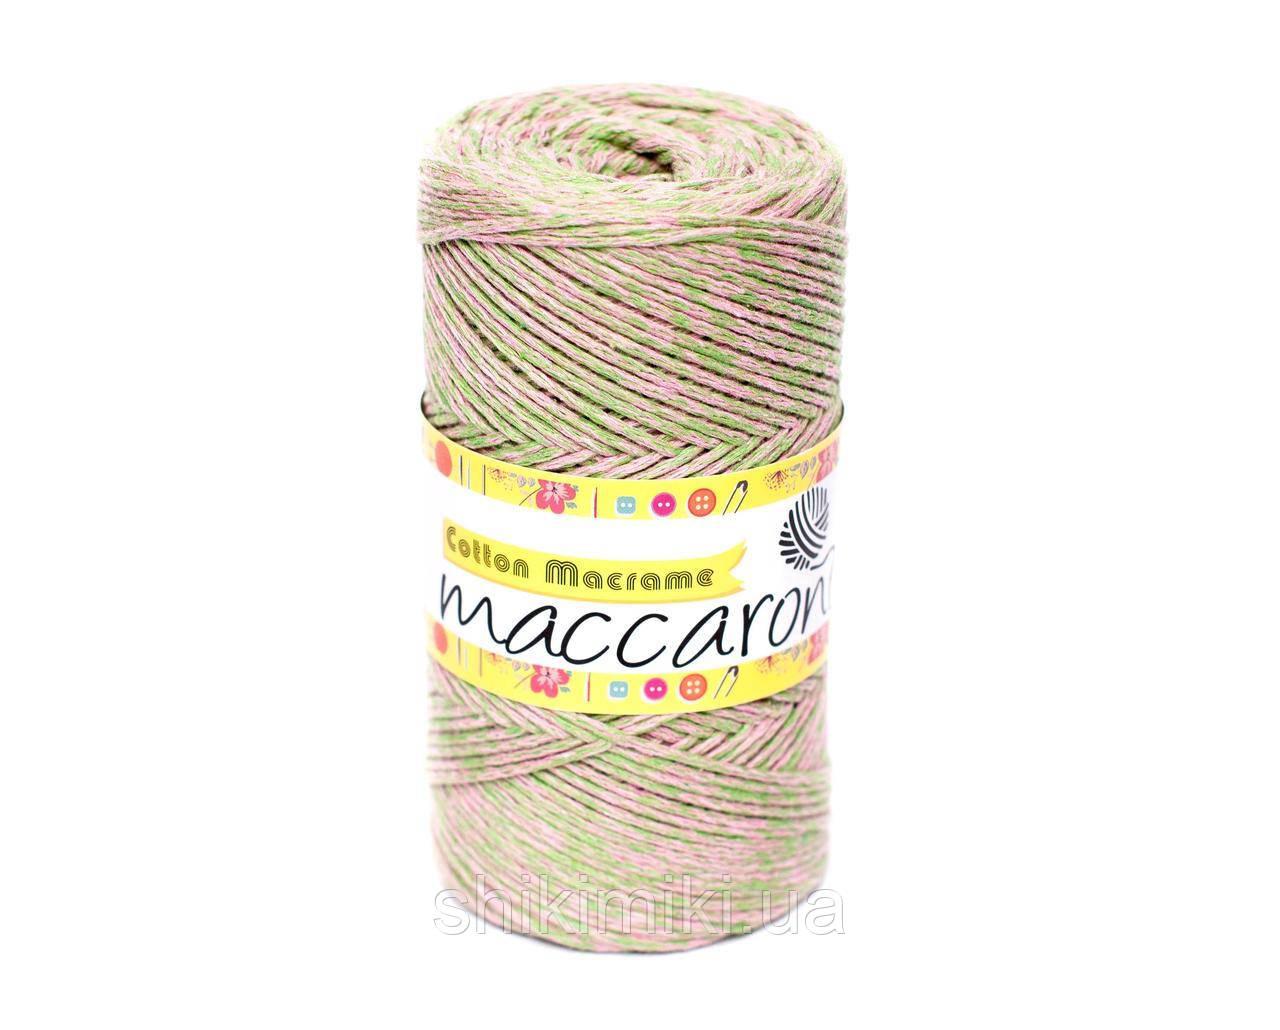 Эко Шнур Cotton Macrame, цвет Салатово-розовый